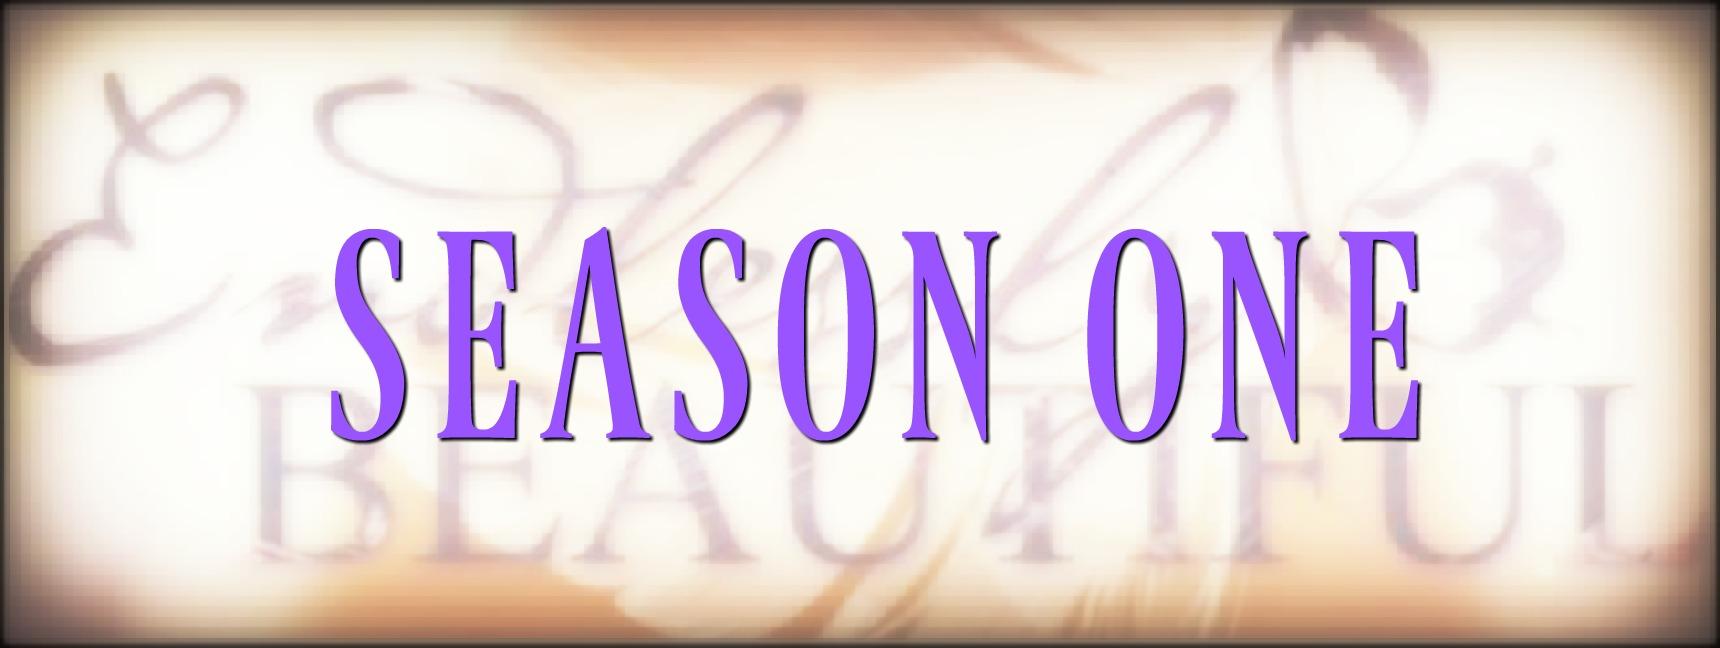 Endlessly-Beautiful-Season-One-Banner.jpg